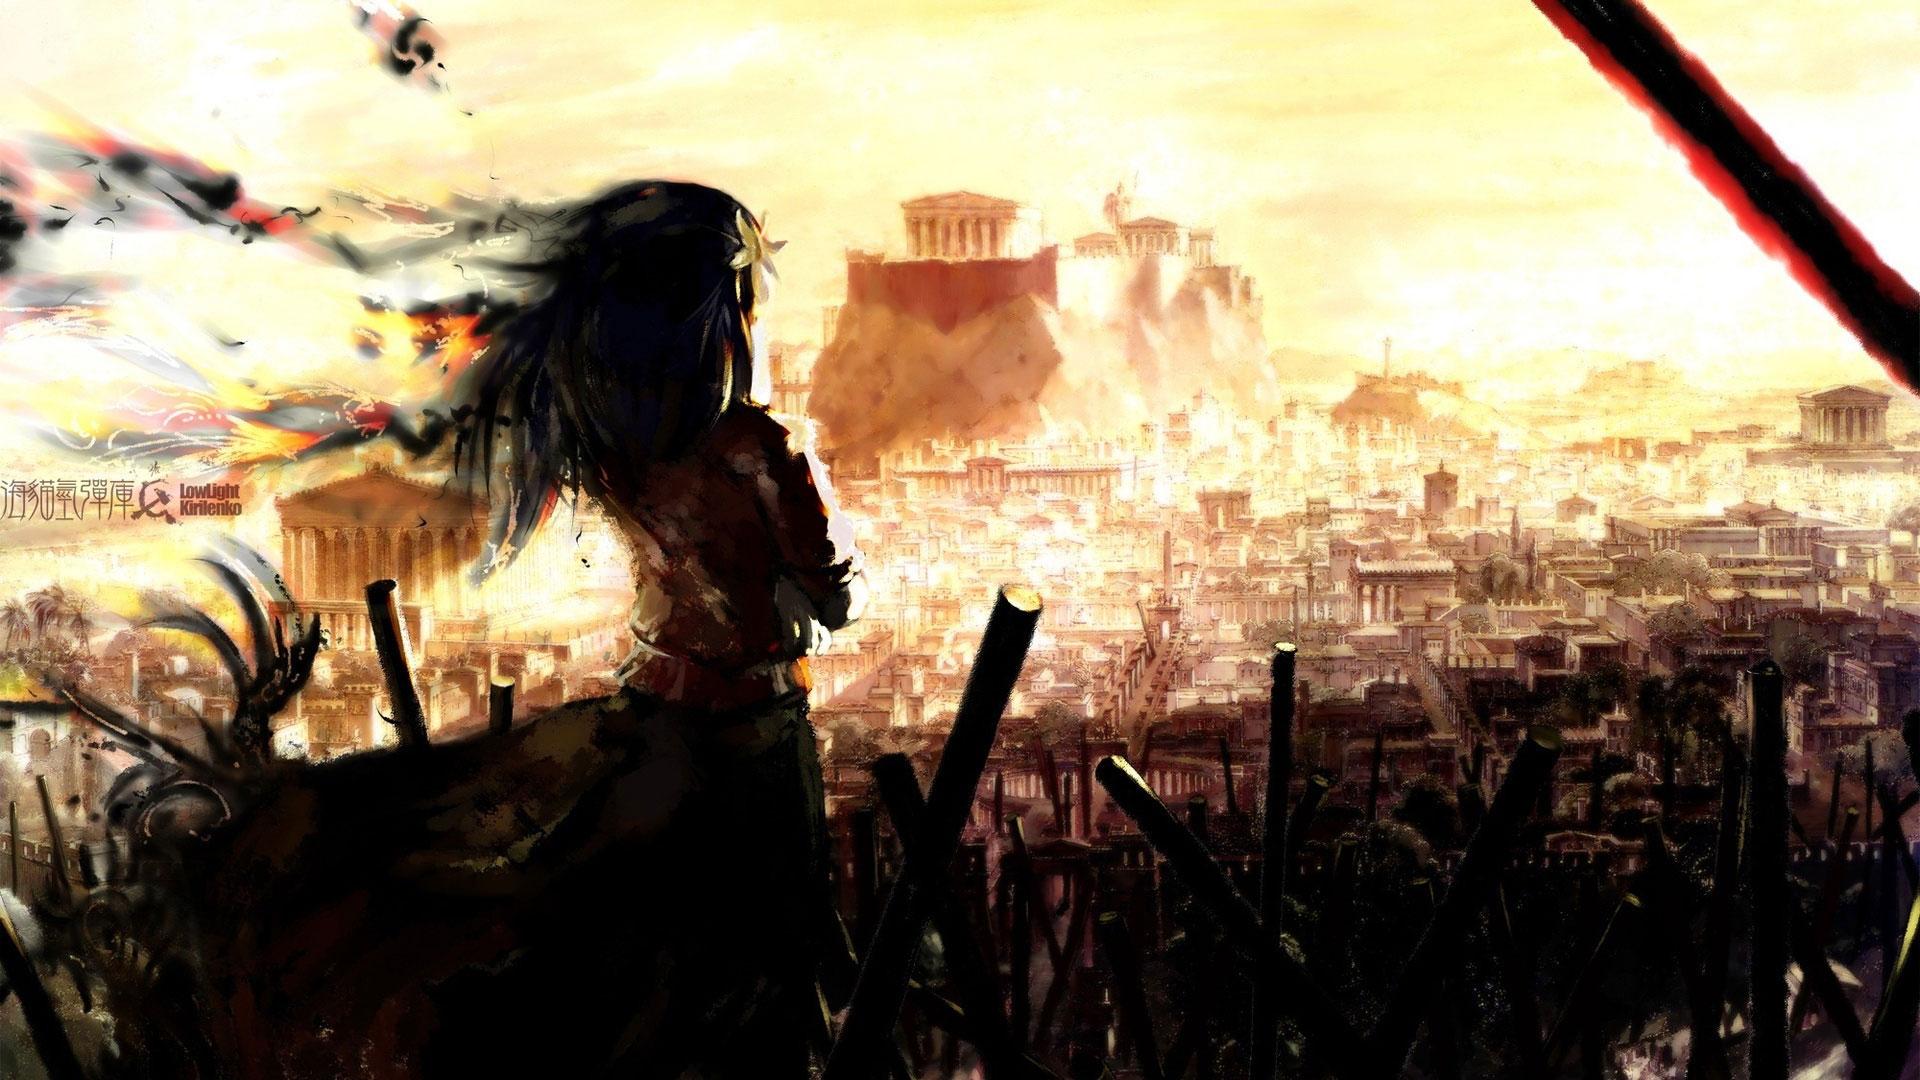 Девушка на фоне разрушенного города